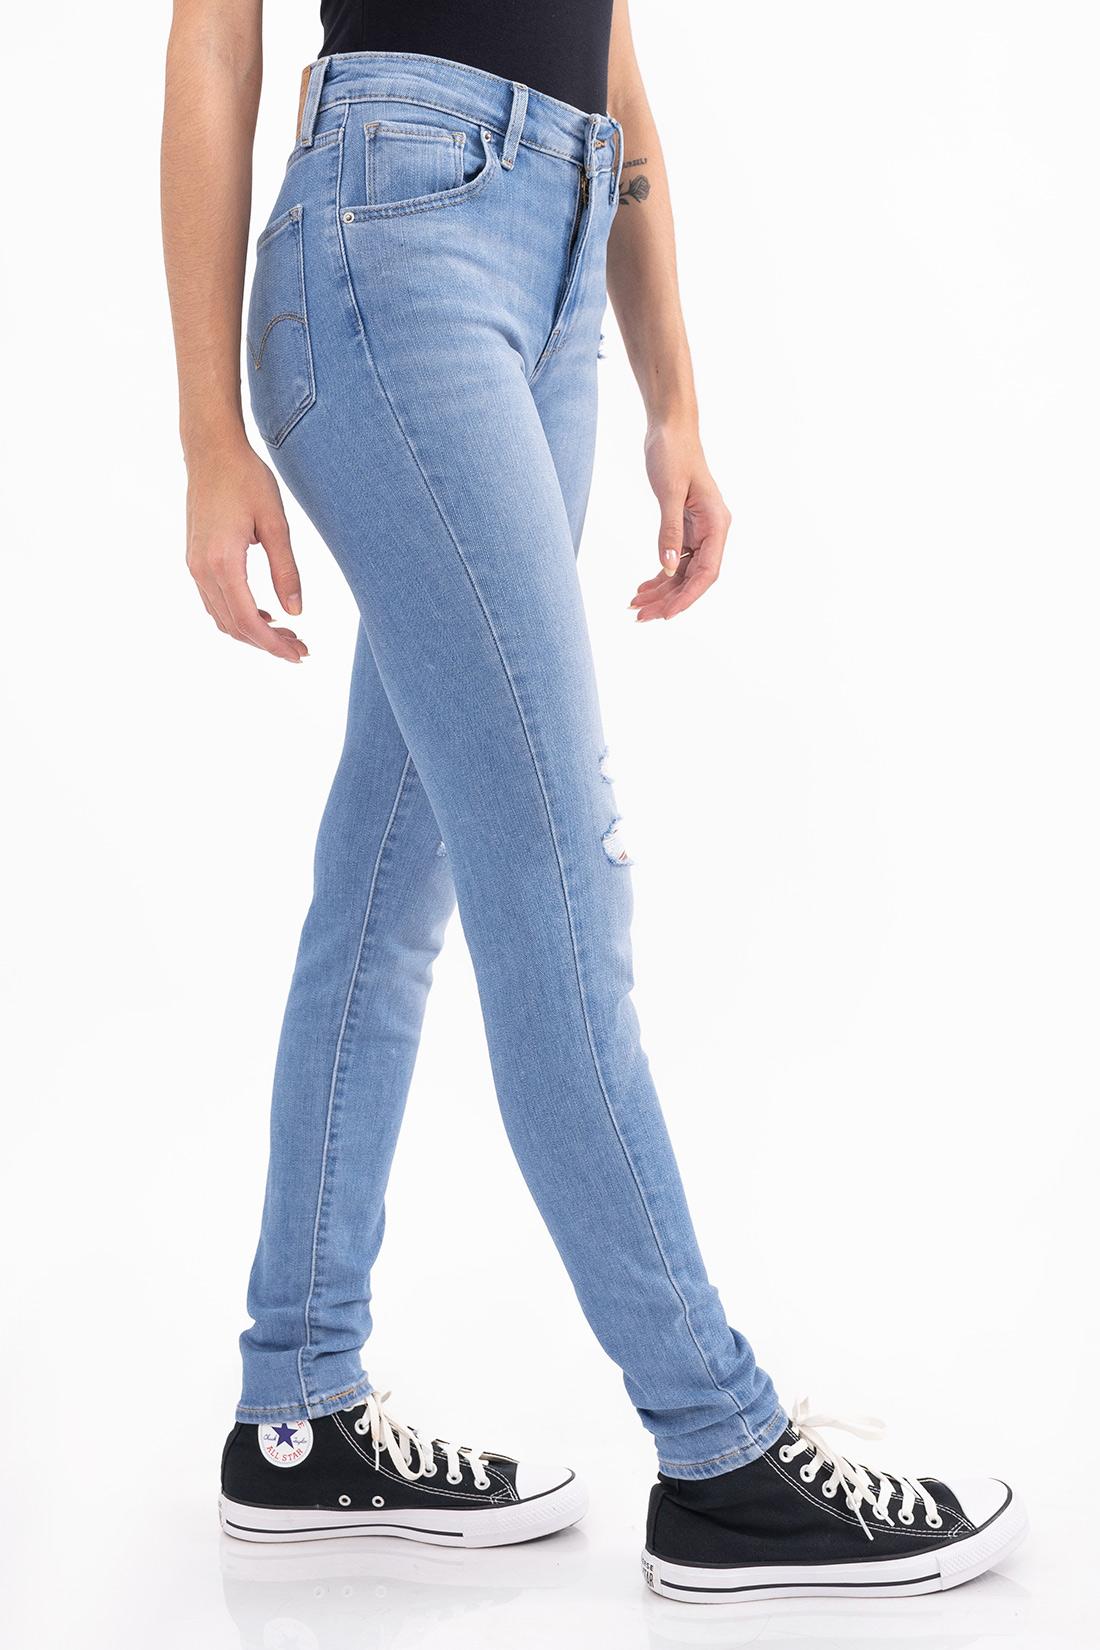 Calca Jeans Jeans 721 High Rise Skinny Rasgos